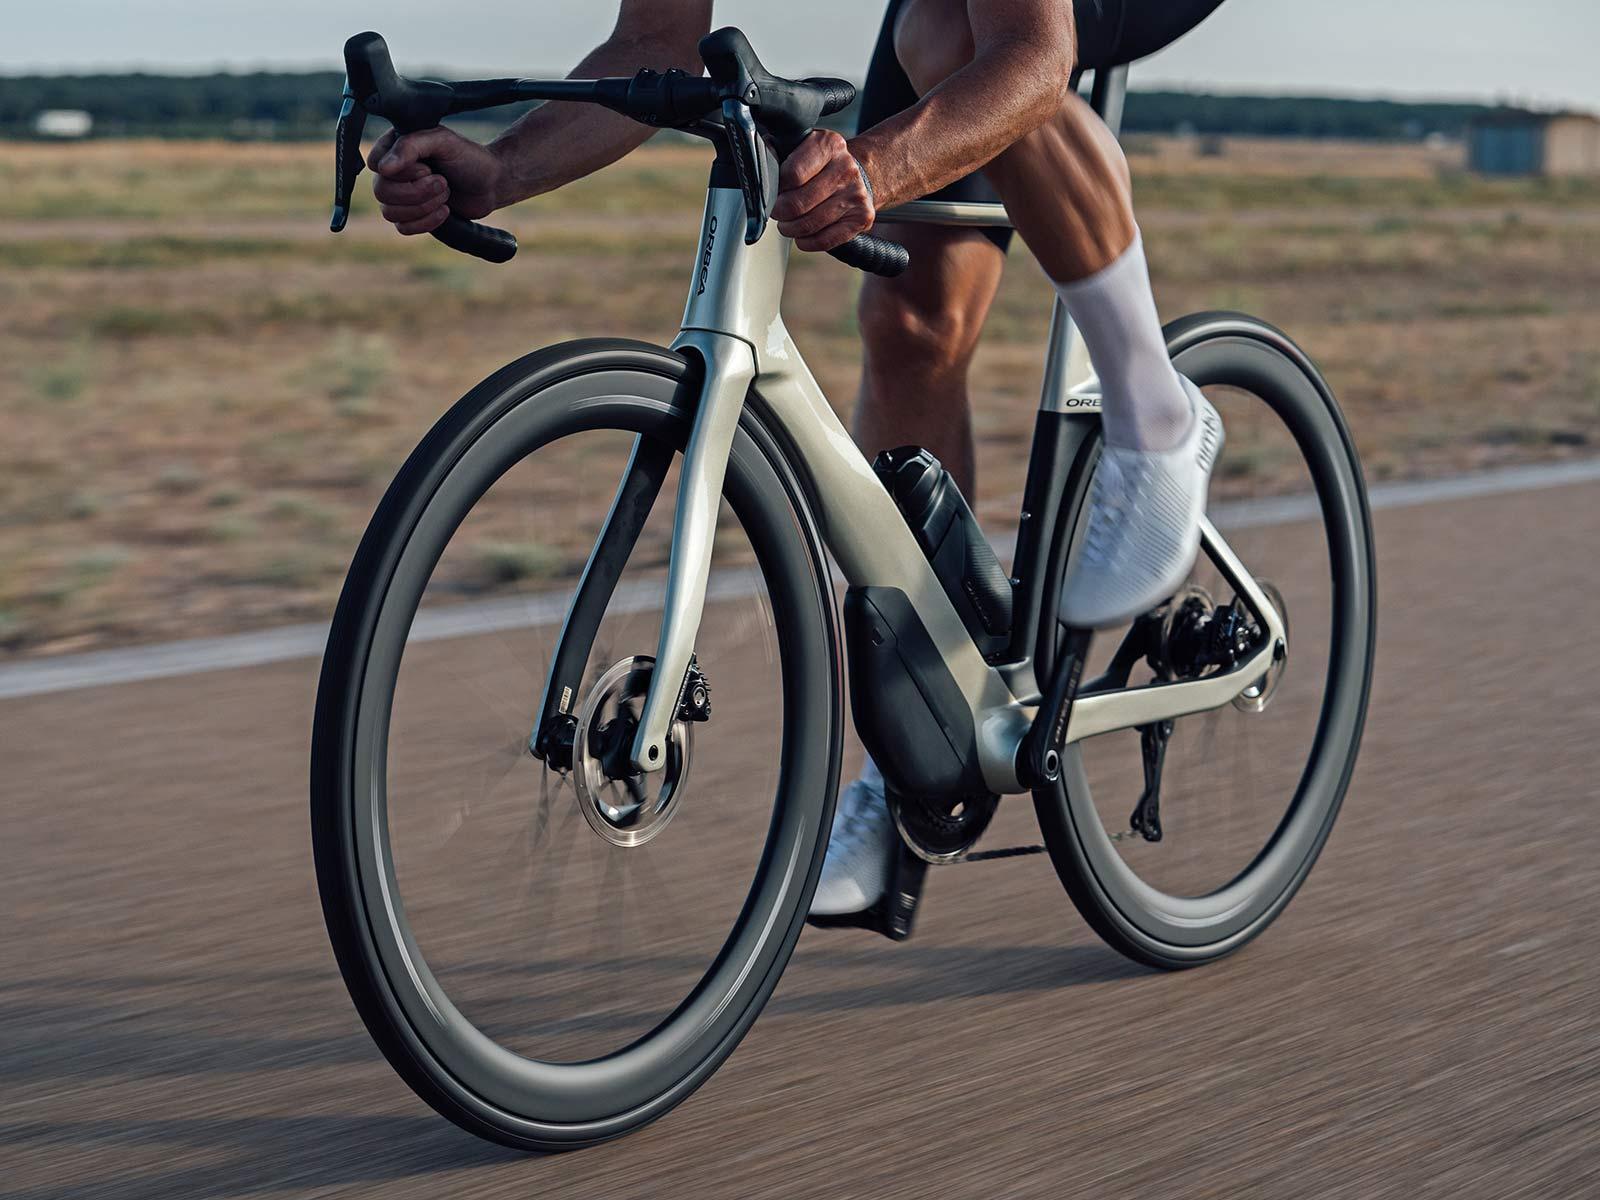 2022 Orbea Orca Aero carbon road bike, riding